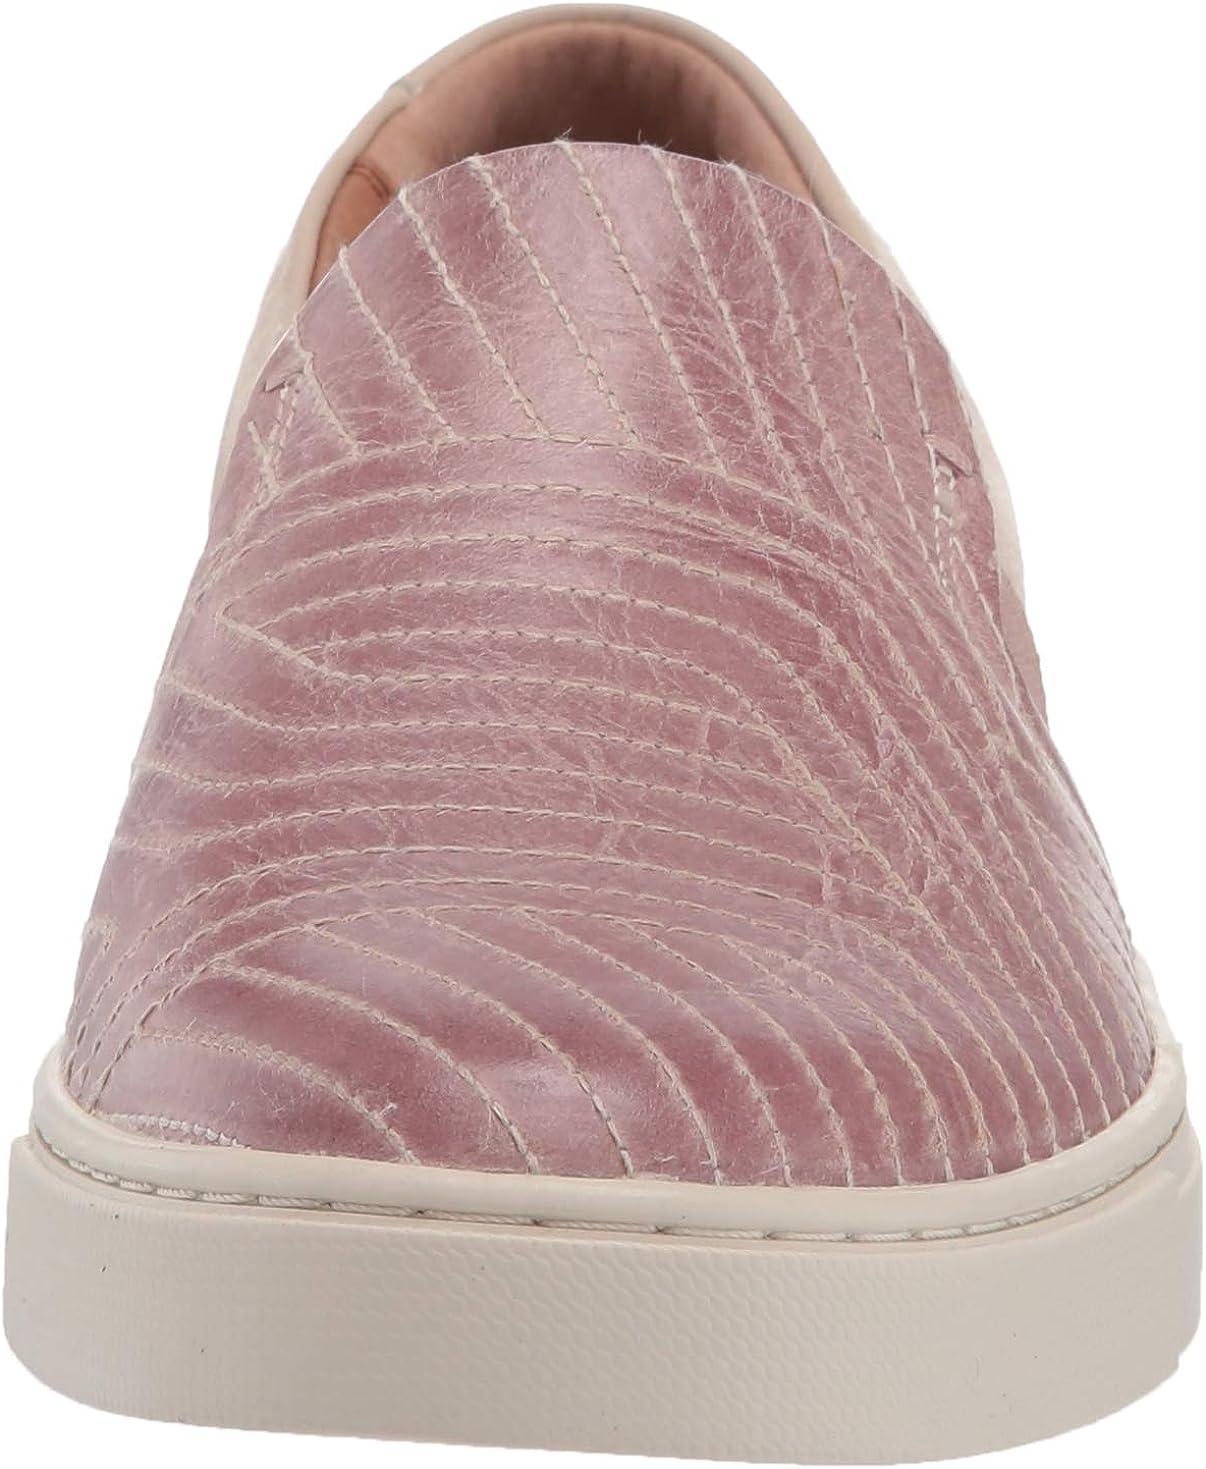 Frye Womens Ivy Stitch Slip on Sneaker